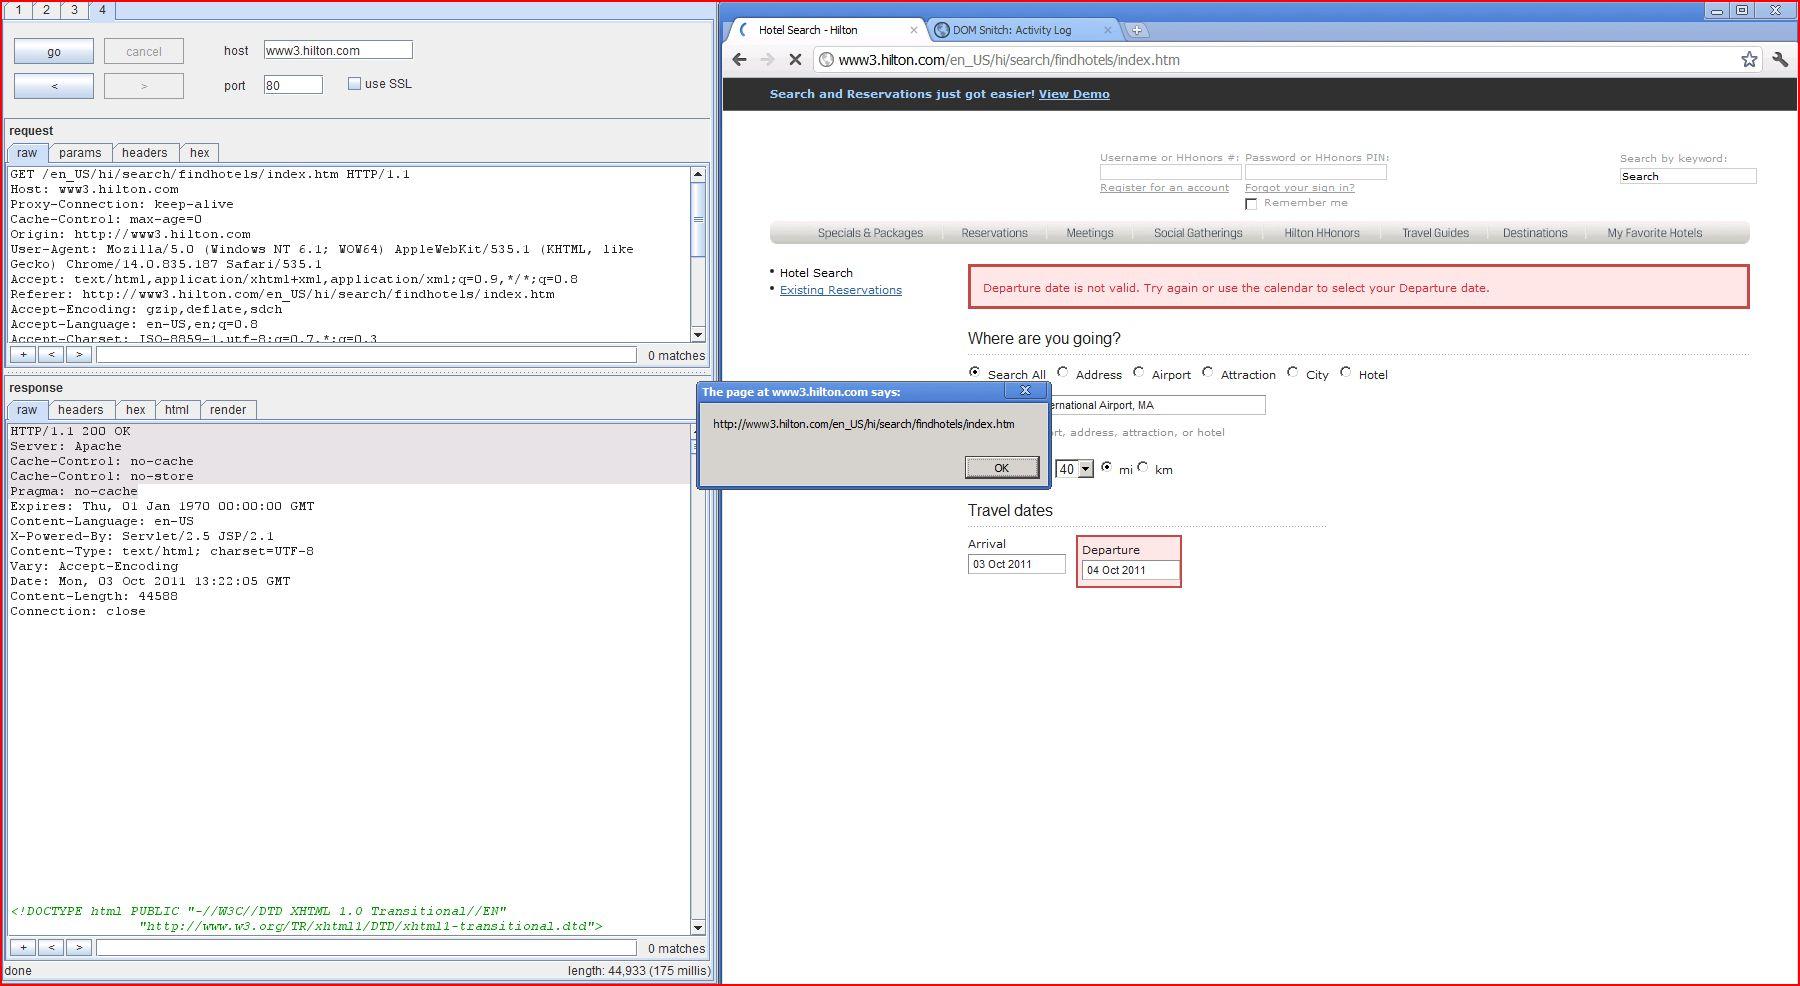 XSS in www3.hilton.com, XSS, DORK, GHDB, Cross Site Scripting, CWE-79, CAPEC-86, Phishing, Weak Configuration